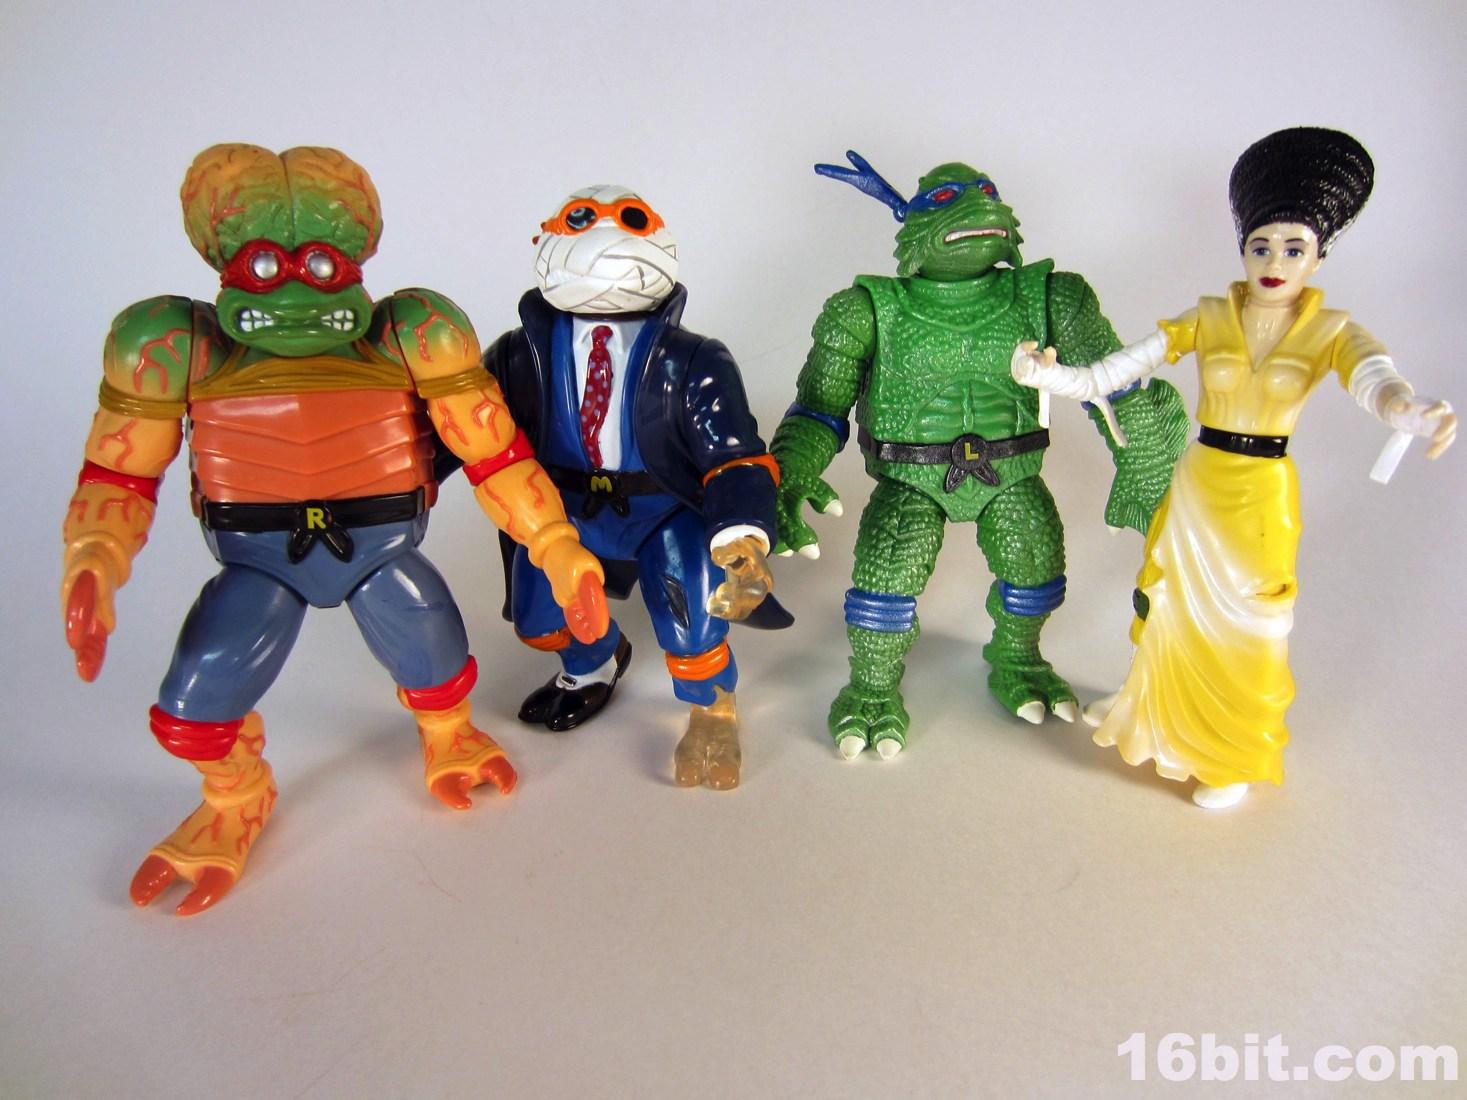 Teenage Mutant Ninja Turtles Mutant Monster Toys : Ninja turtles and the universal monsters another s oddity